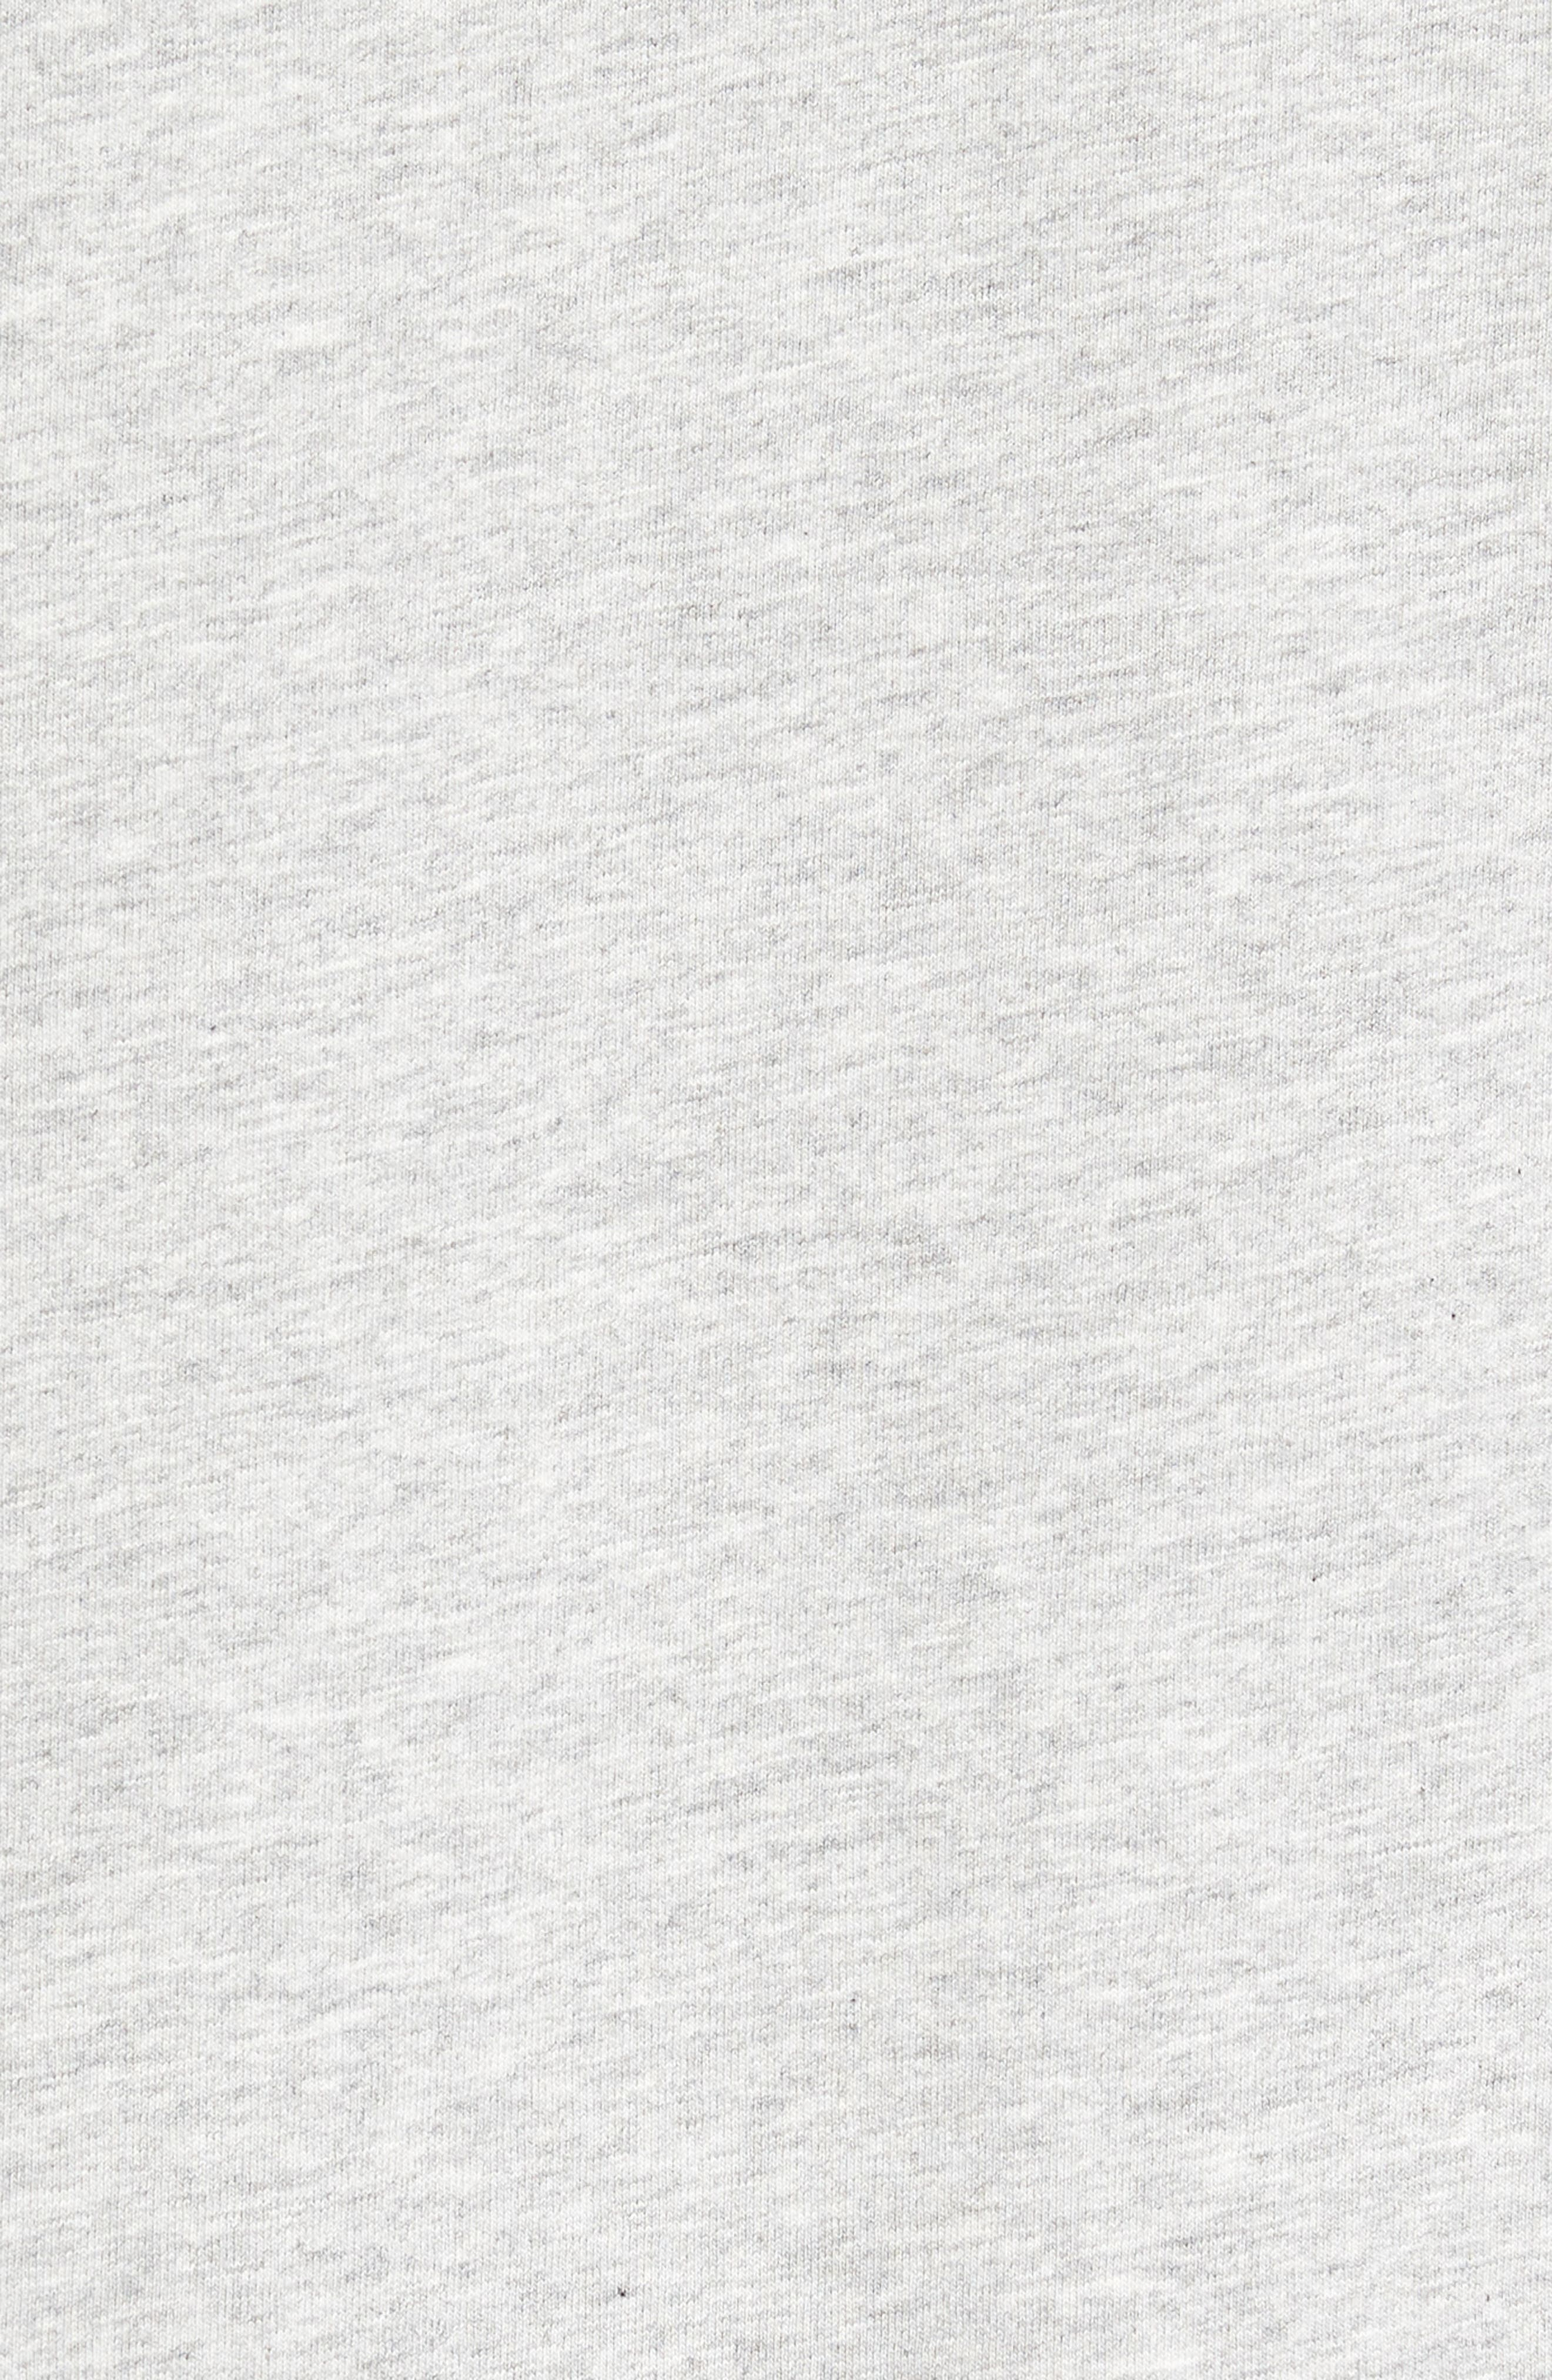 Regular Fit Golf T-Shirt,                             Alternate thumbnail 5, color,                             Gray Heather